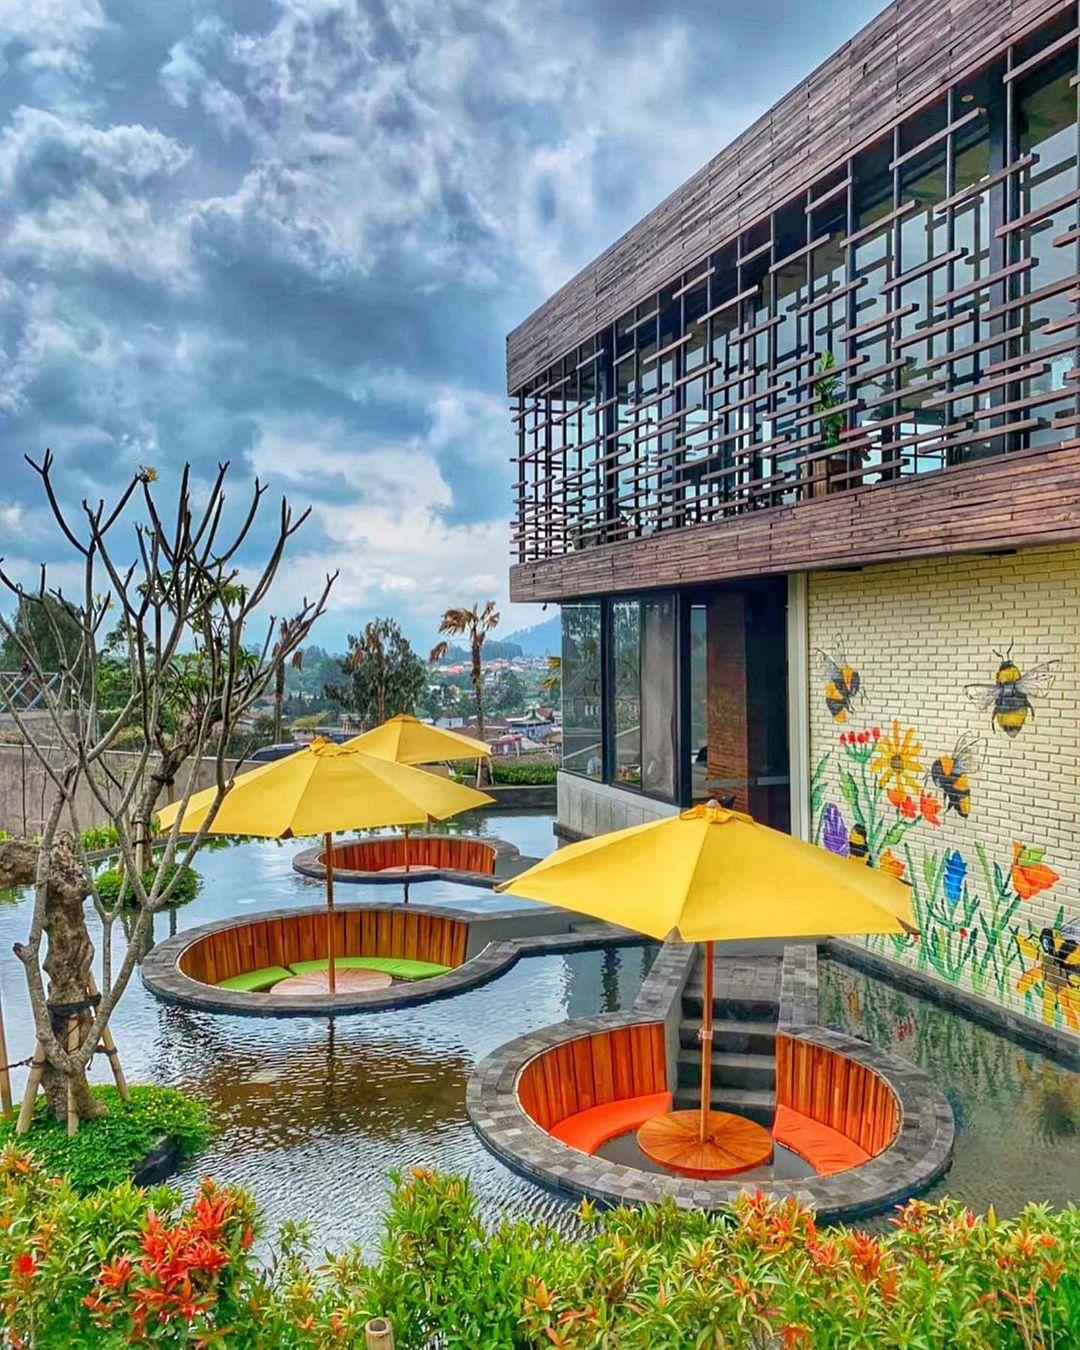 Cerita Kita Cafe & Eatery Magelang